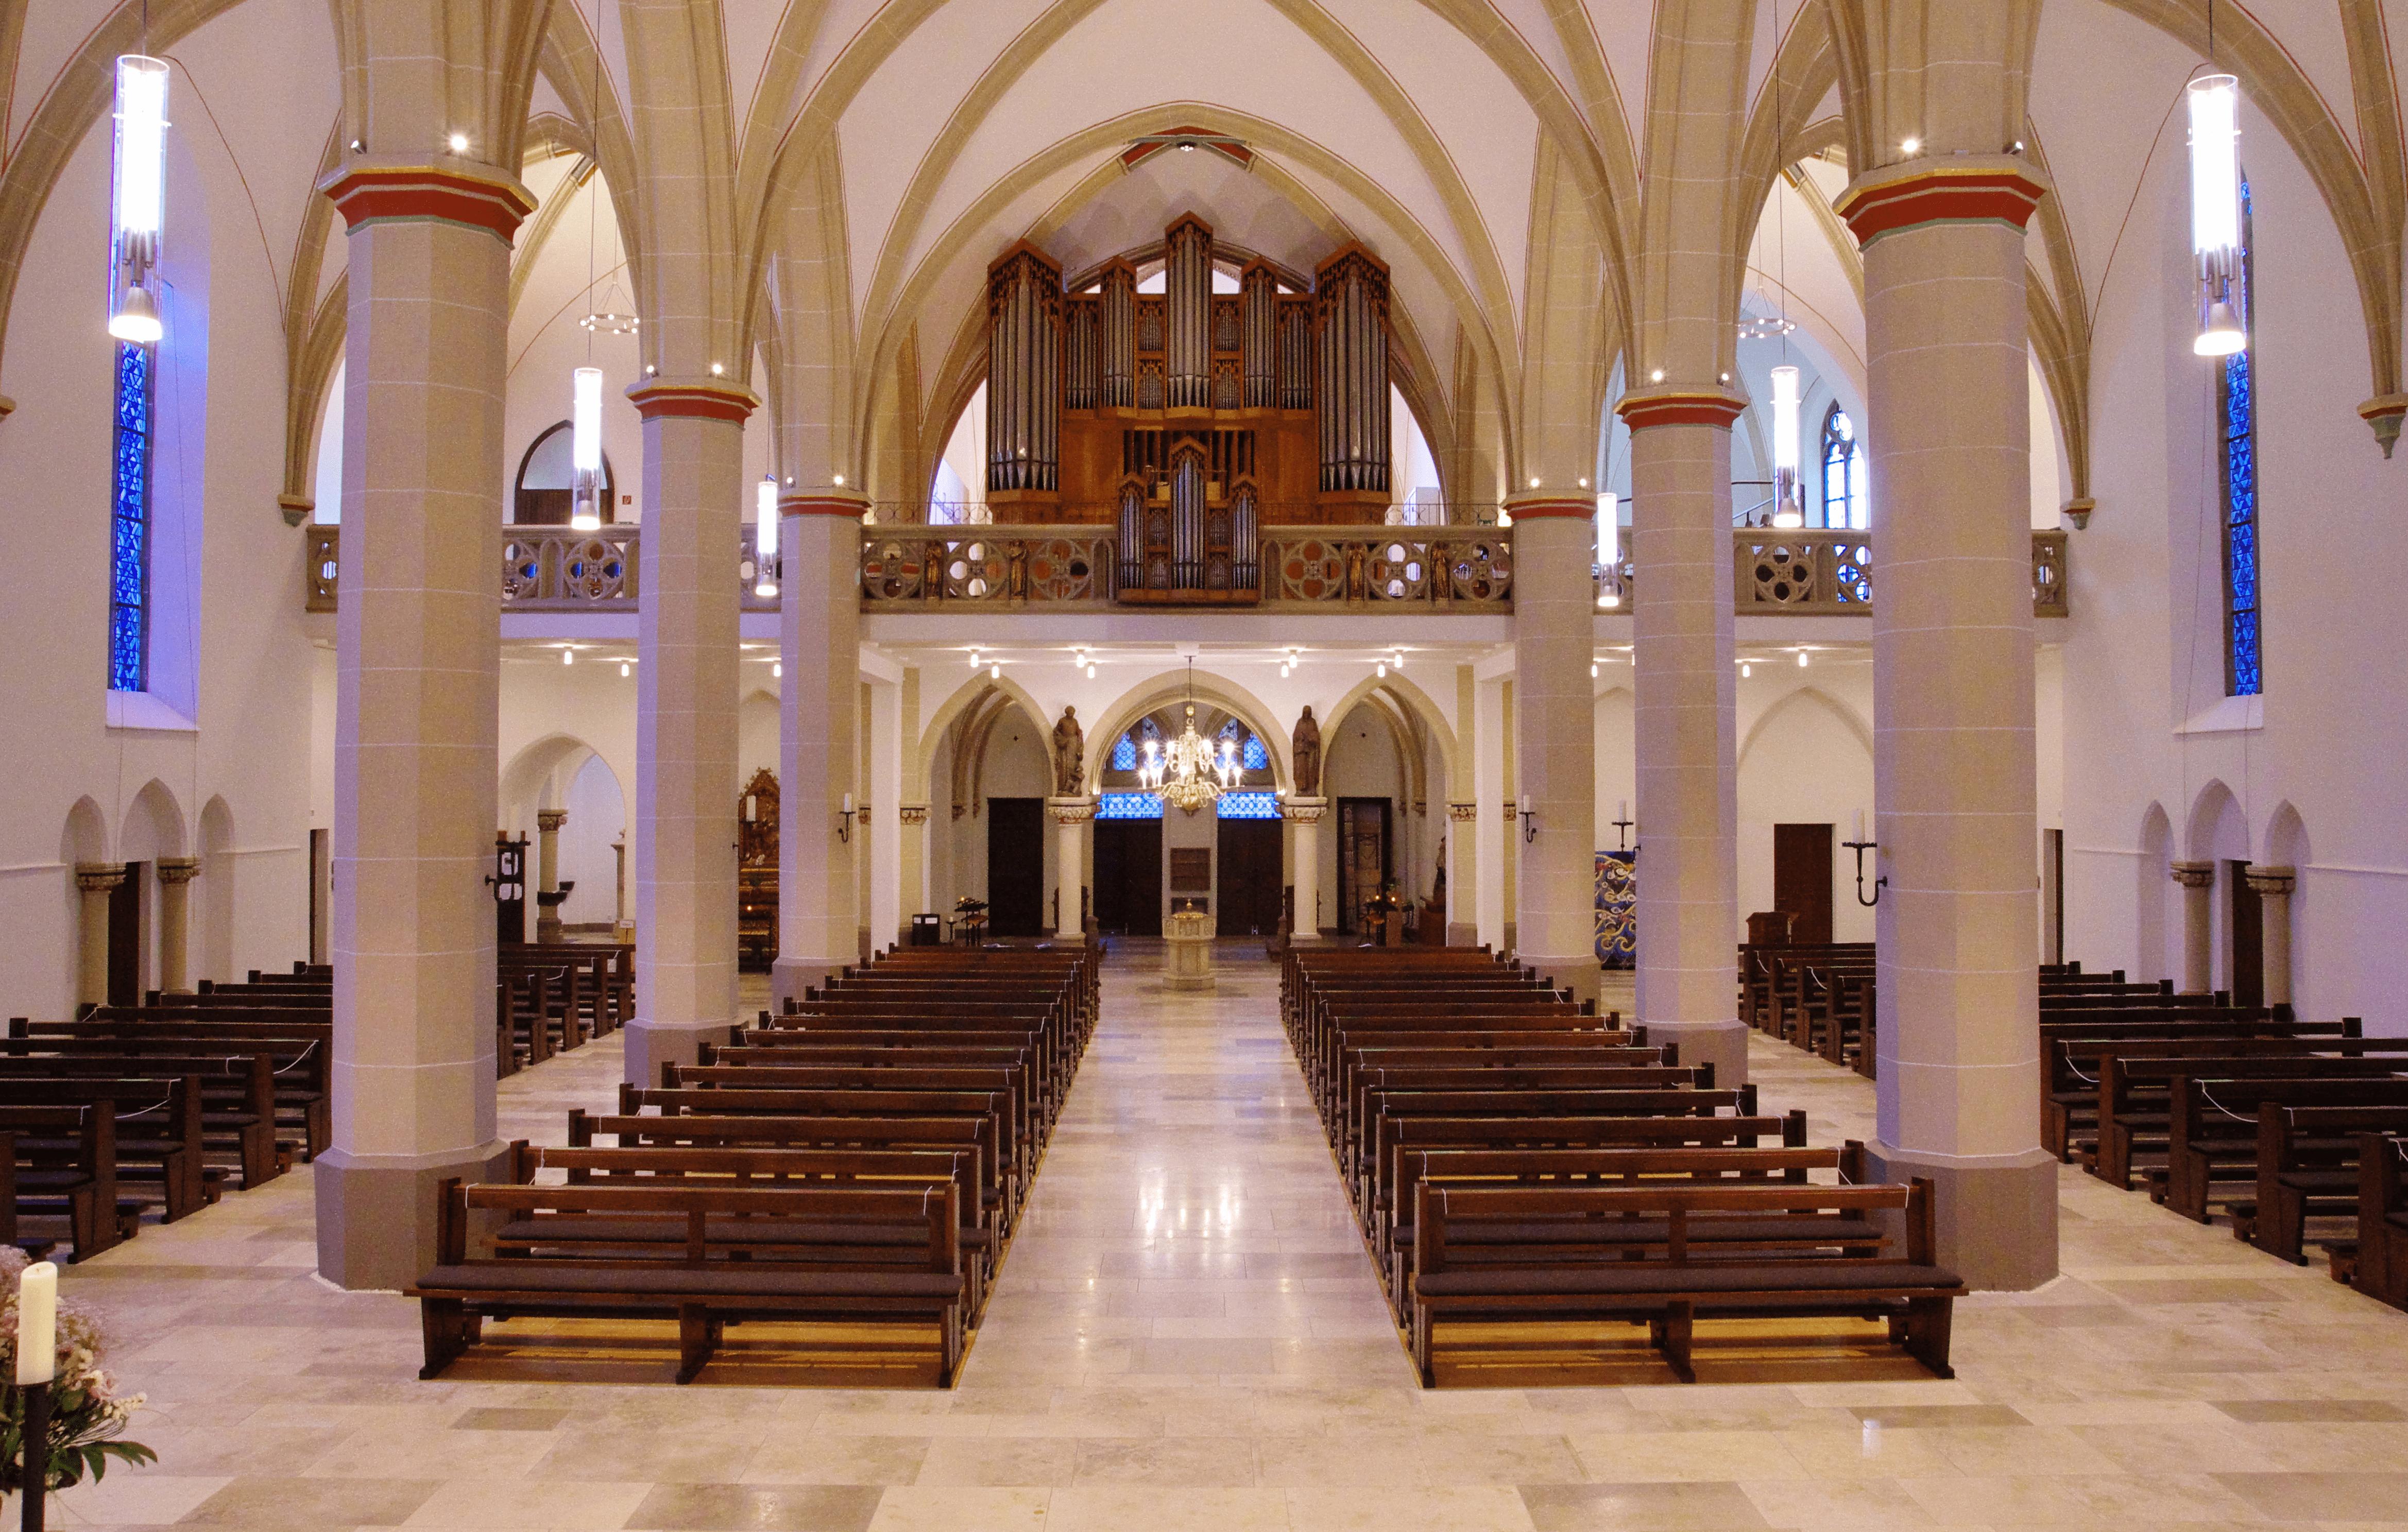 Impulse an Markttagen in der St. Pankratius Kirche